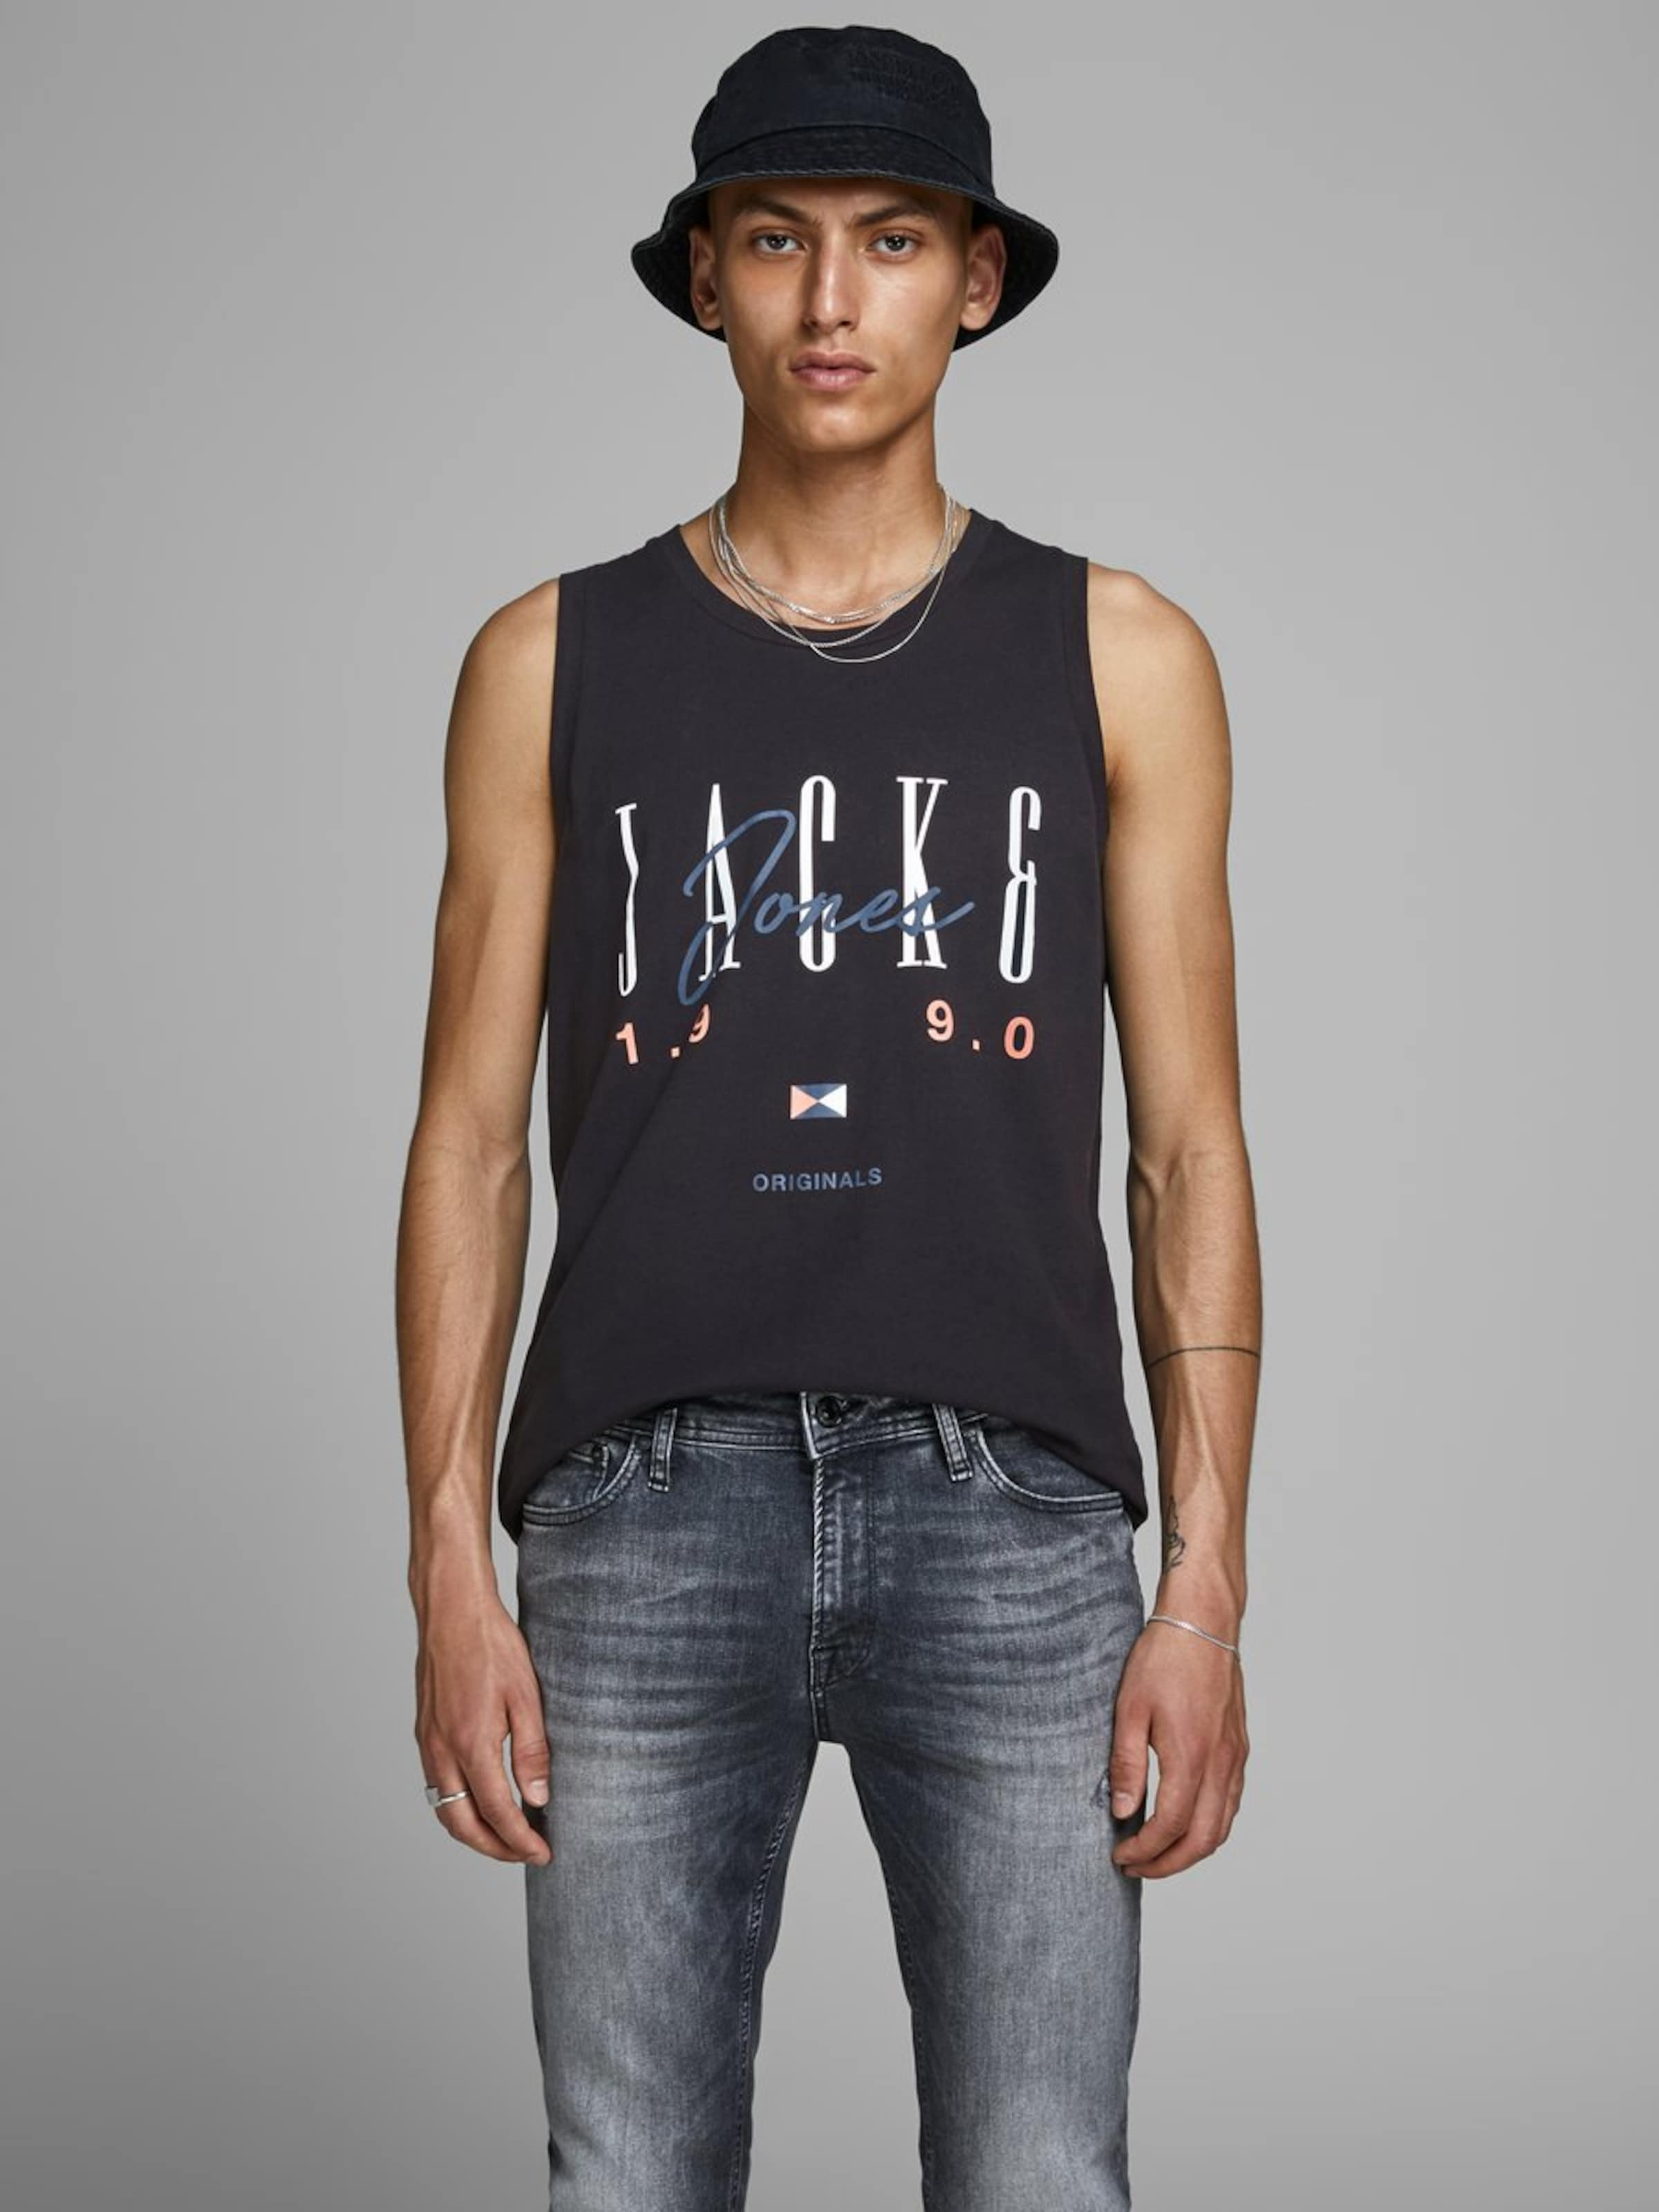 Bleu Noir grisSaumon Blanc Jones T shirt Jackamp; En F1lJTKc